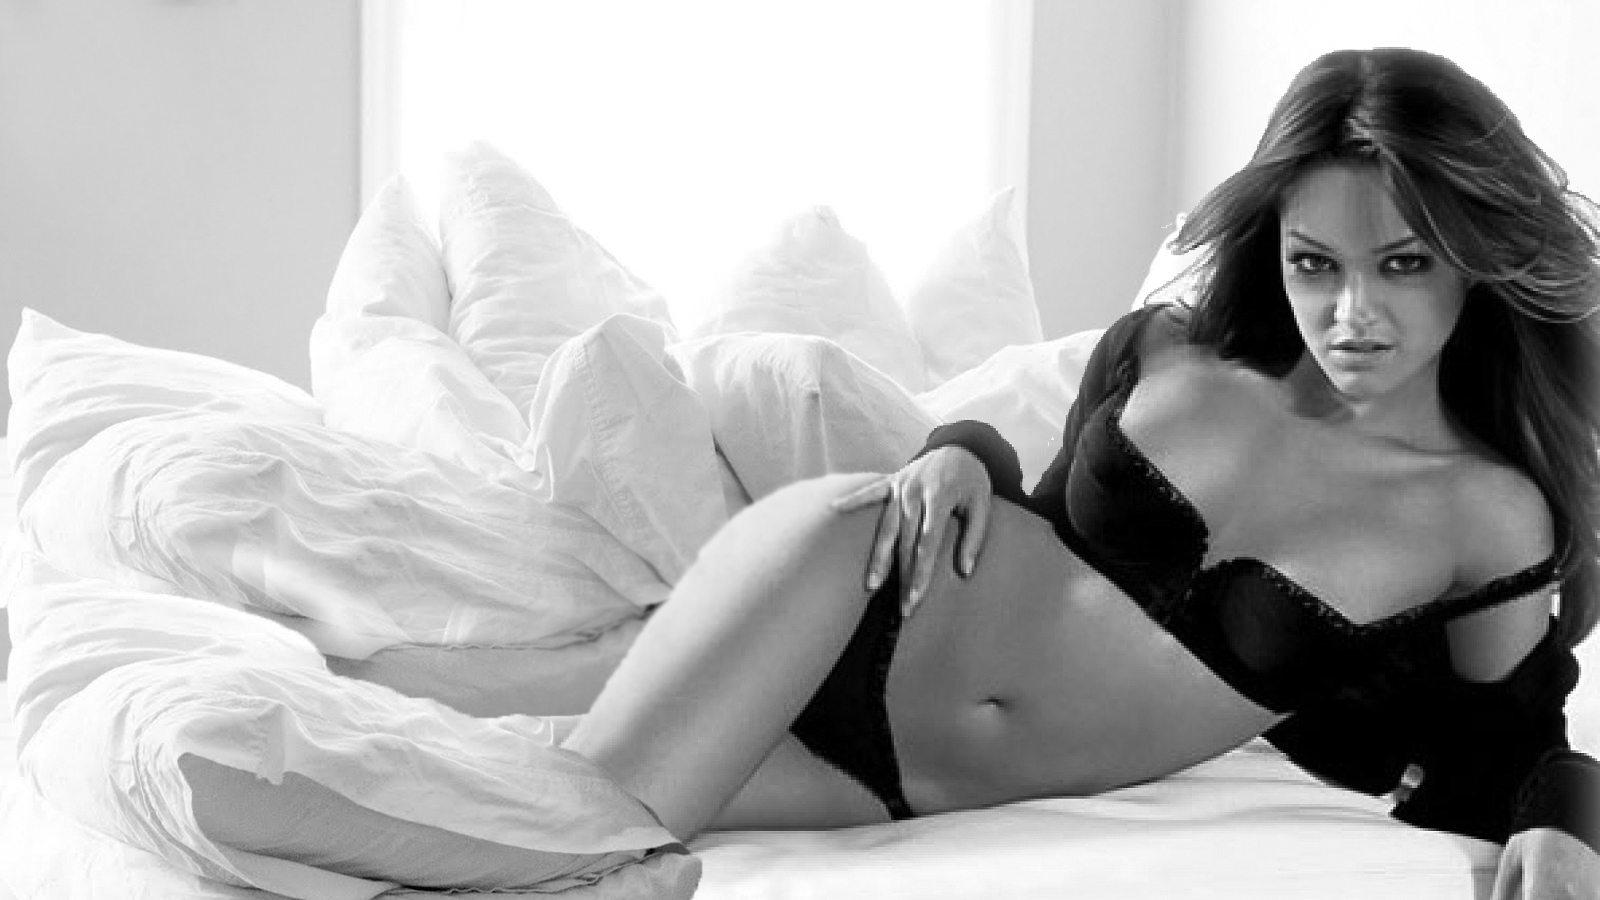 Erotica Paula Garces nude photos 2019